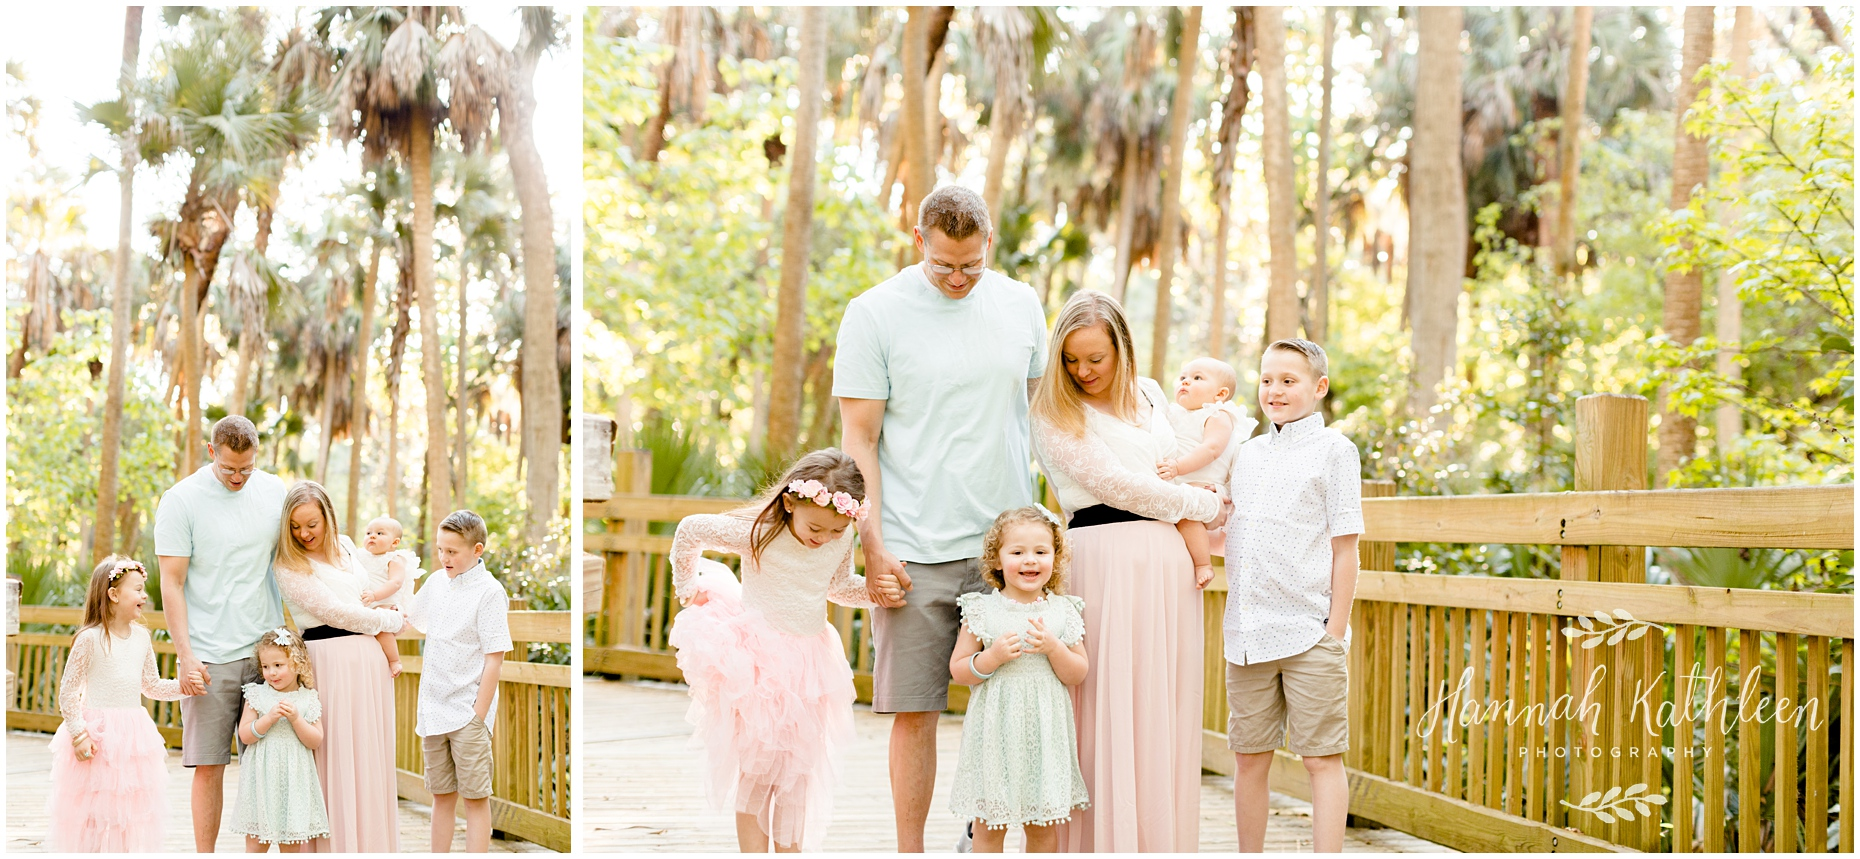 Wurl_Celebration_Orlando_Central_Florida_Family_Professional_Photographer